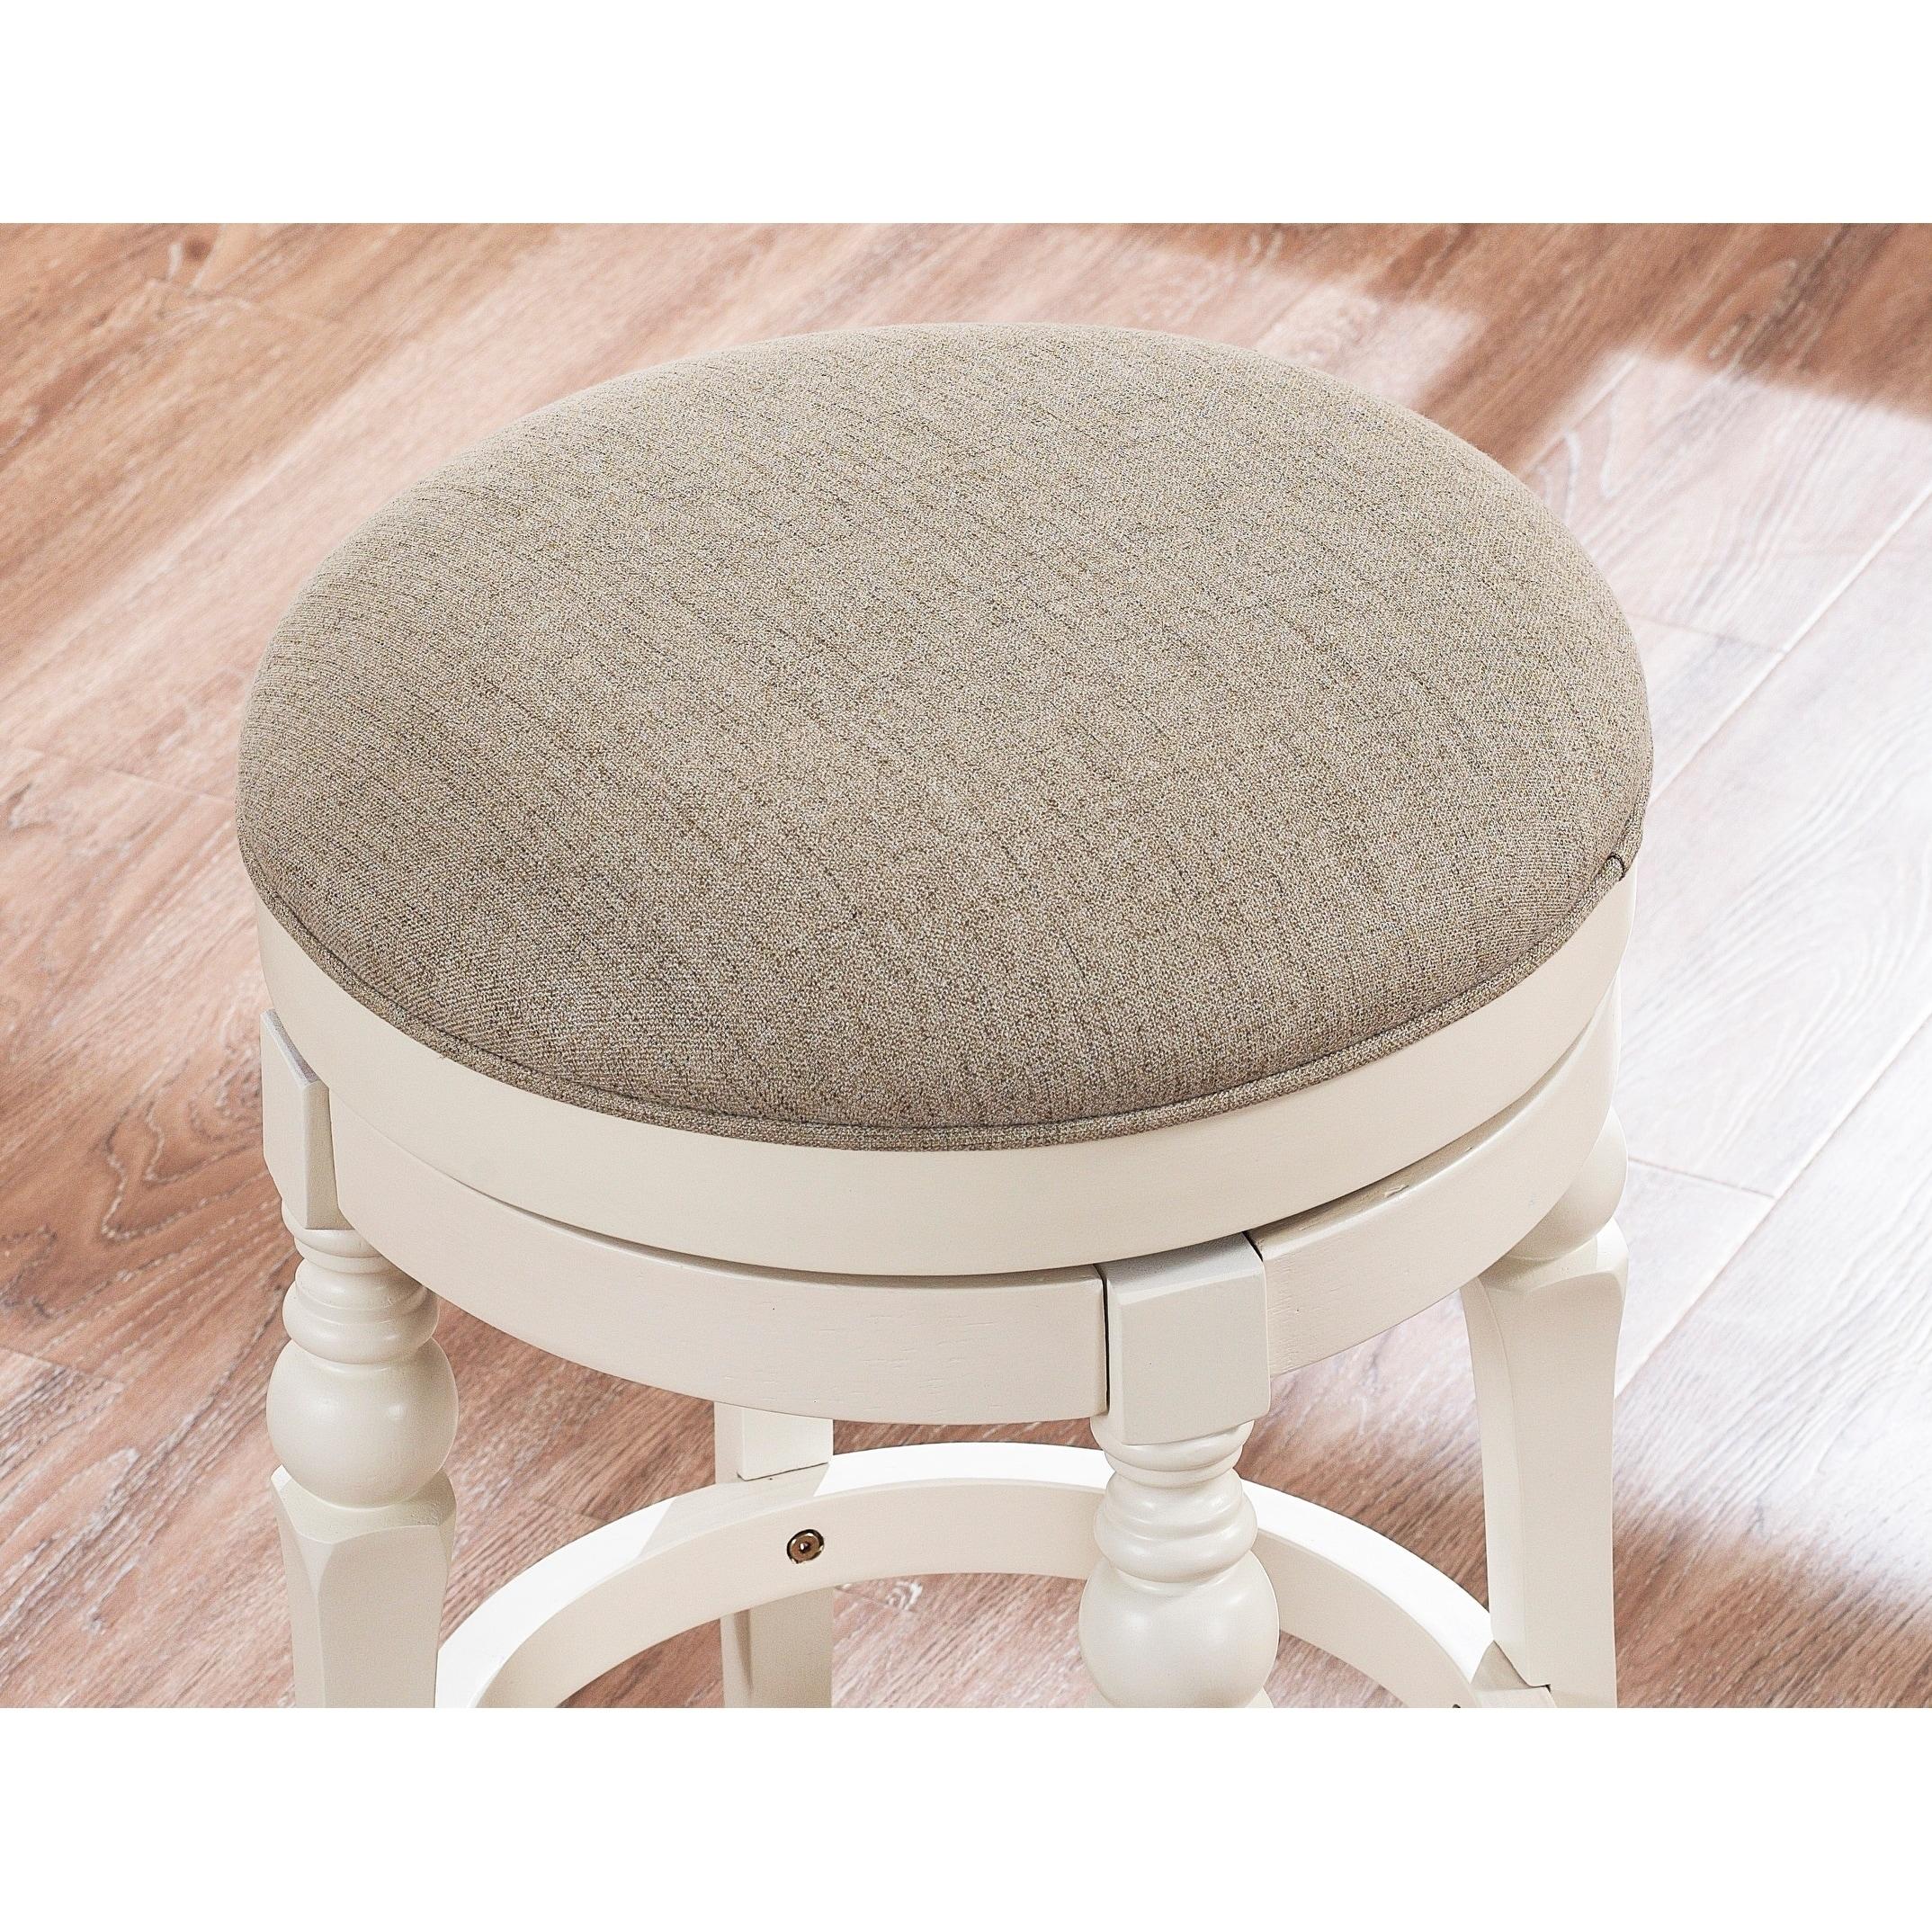 Carella Seat: characteristics, dignity